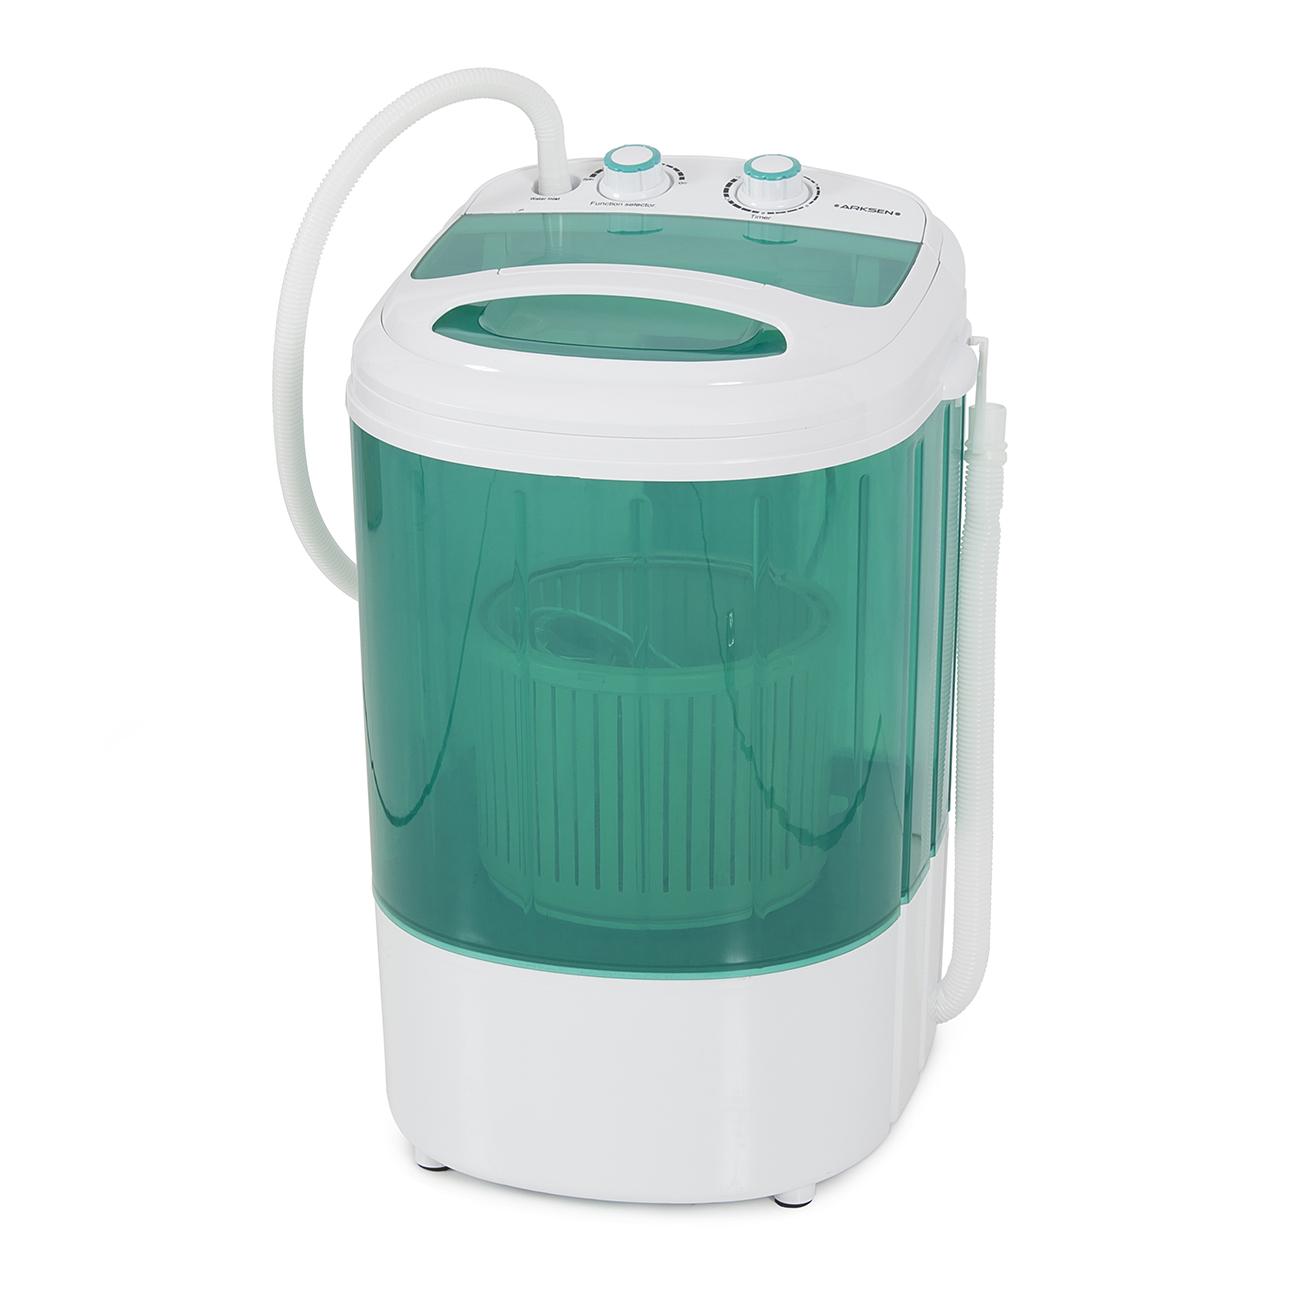 Portable Spin Dry Cycle Washing Machine W Basket Dorm